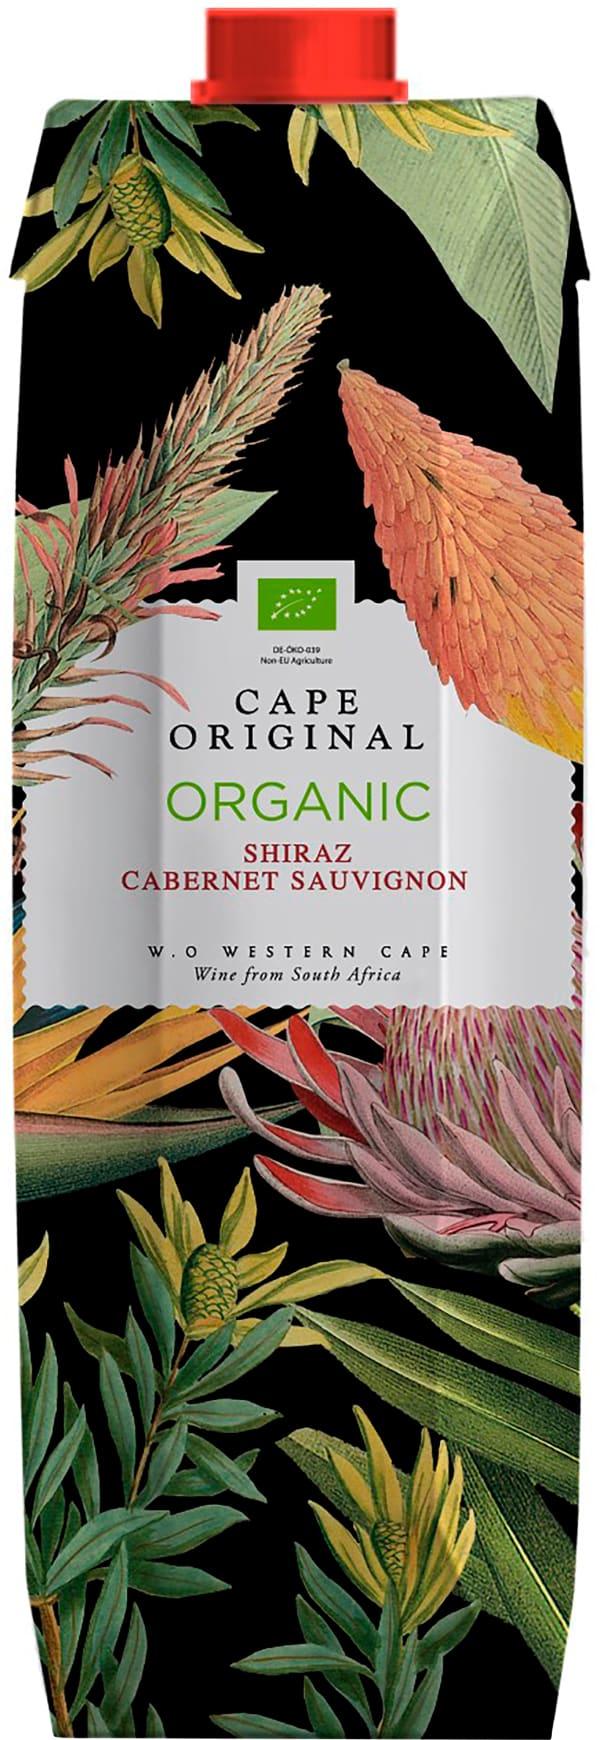 Cape Original Shiraz Cabernet Sauvignon Organic 2020 carton package